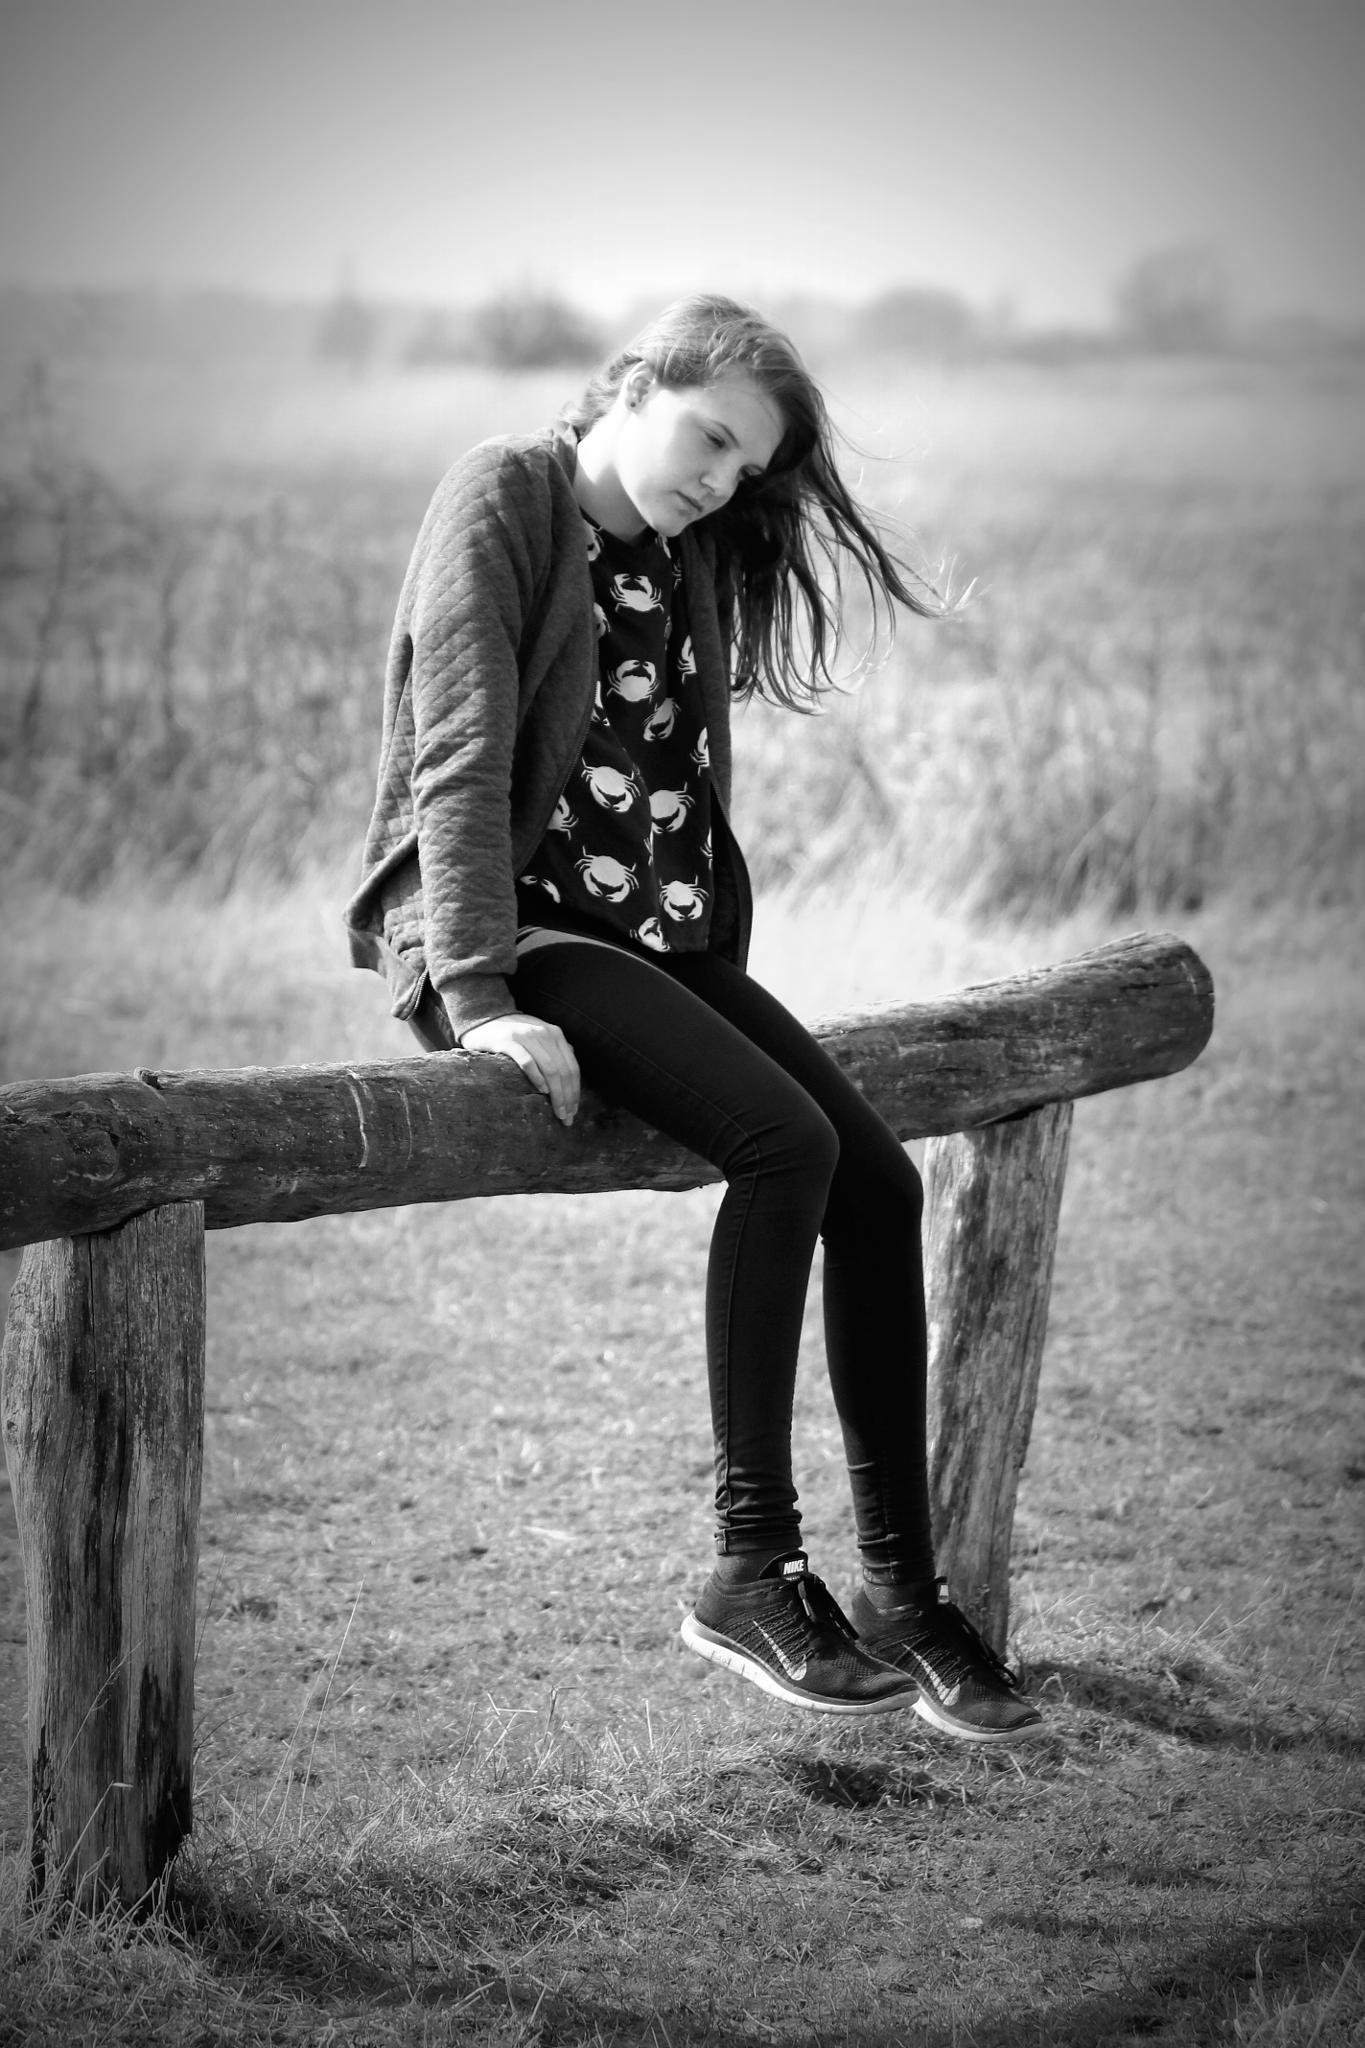 Thinking by mette.p.svendsen